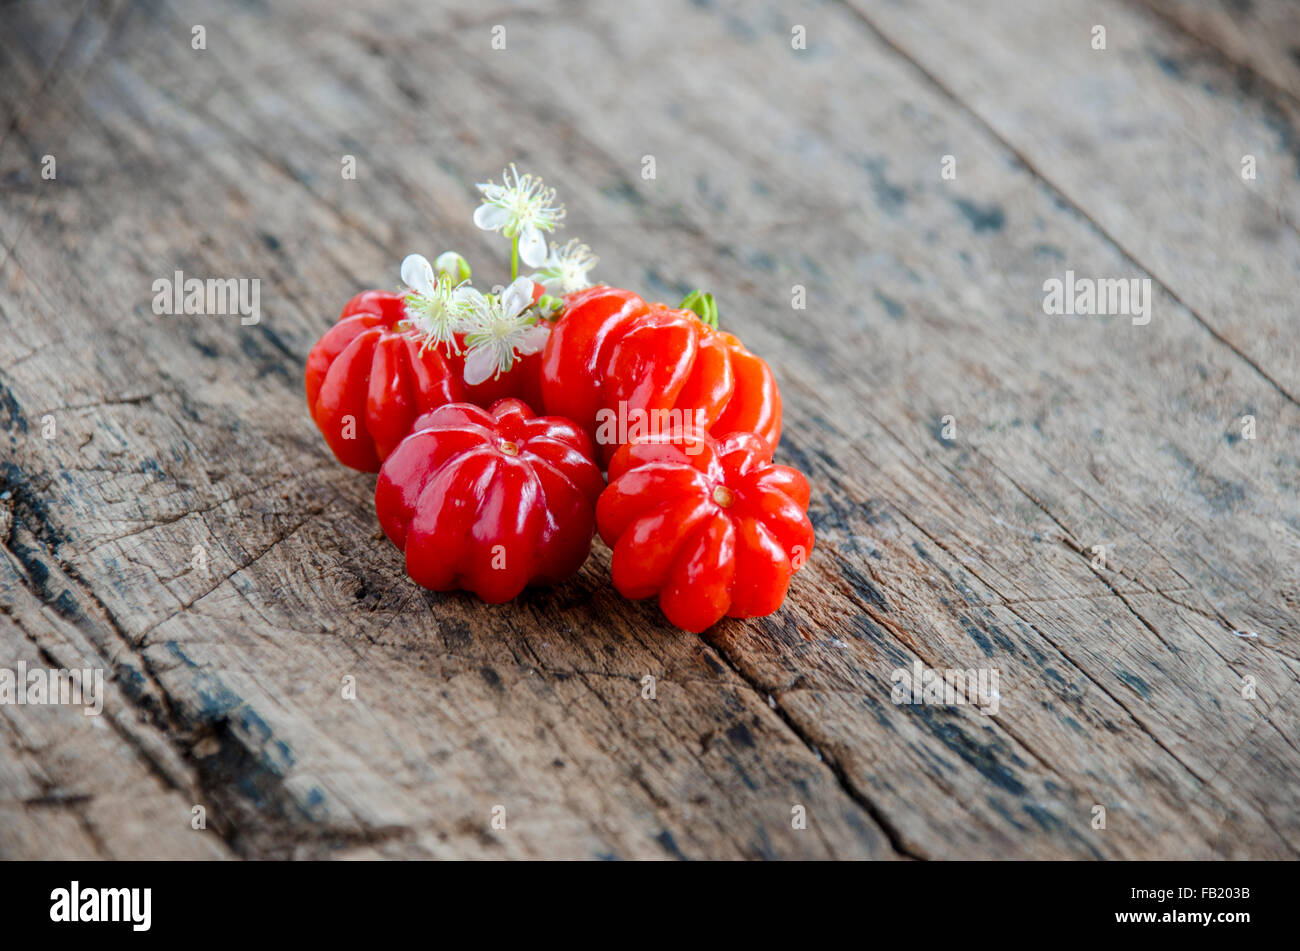 Tropical fruit called Pitanga, Brazilian cherry,Suriname cherry,Cayenne cherry.Shallow depth of field. - Stock Image